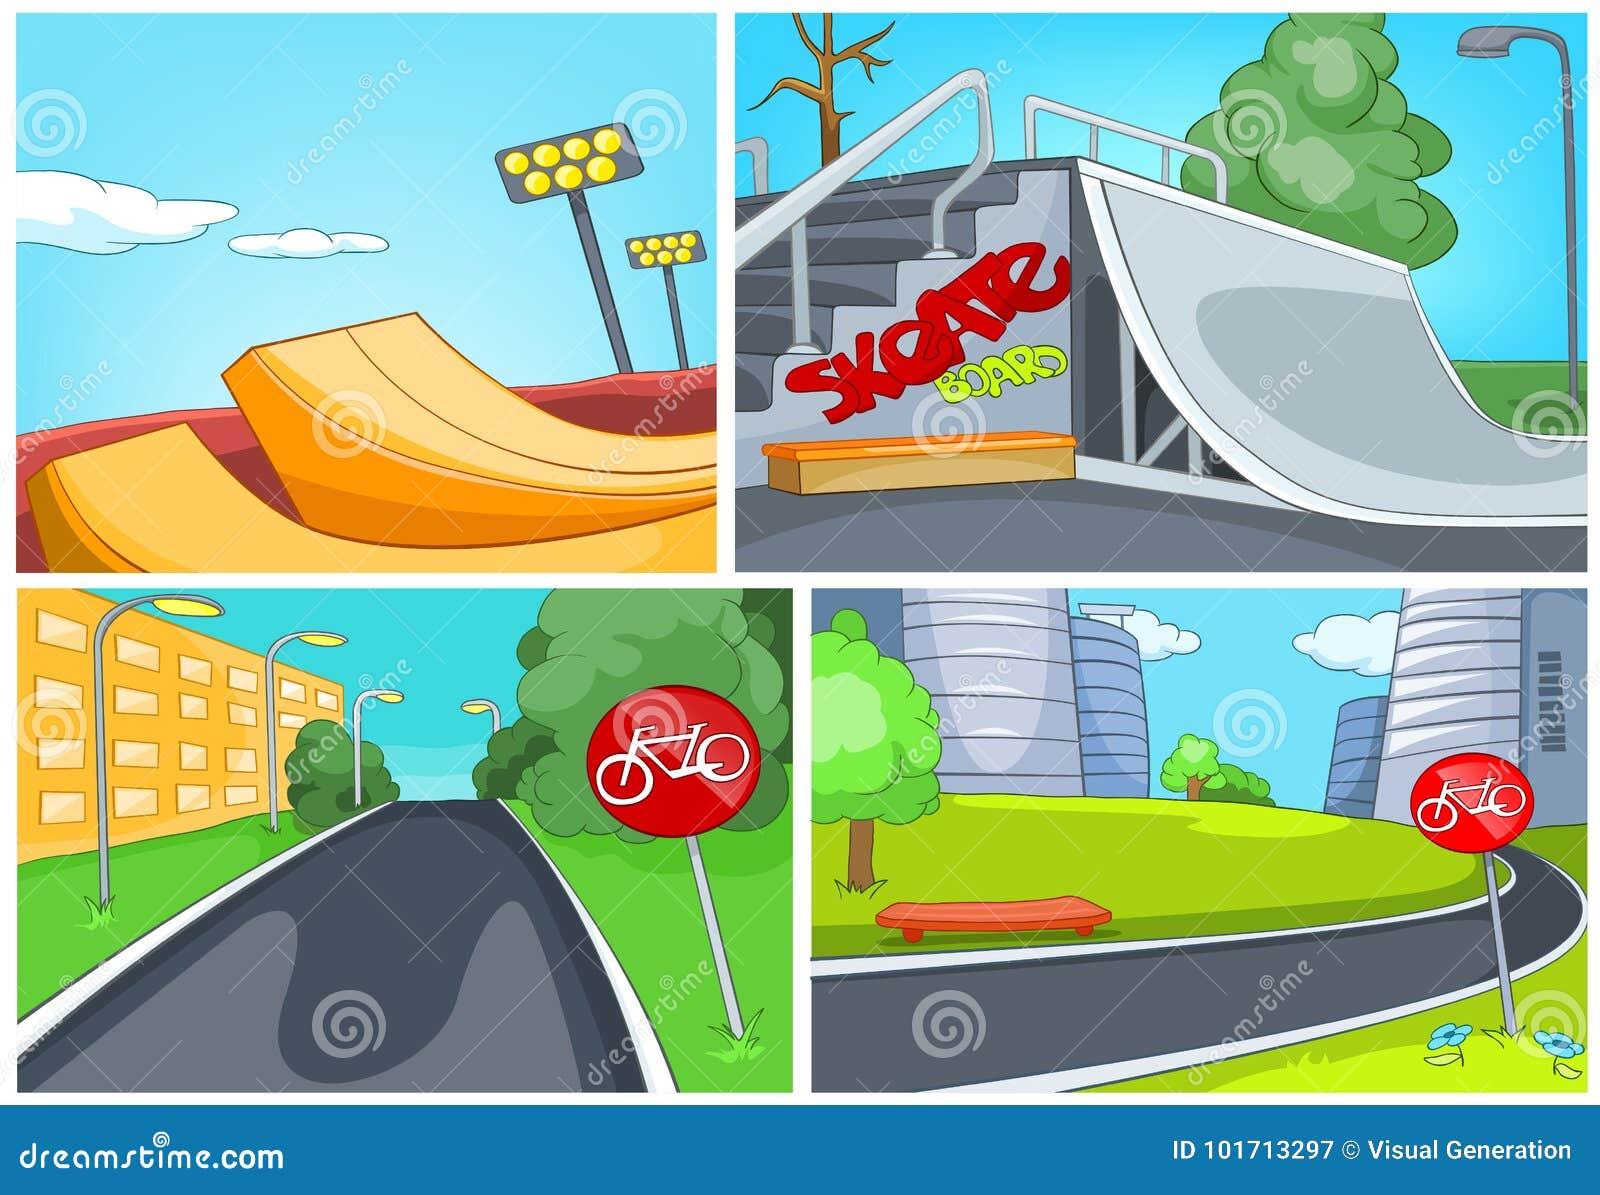 Cartoon set of skatepark and bike lane backgrounds